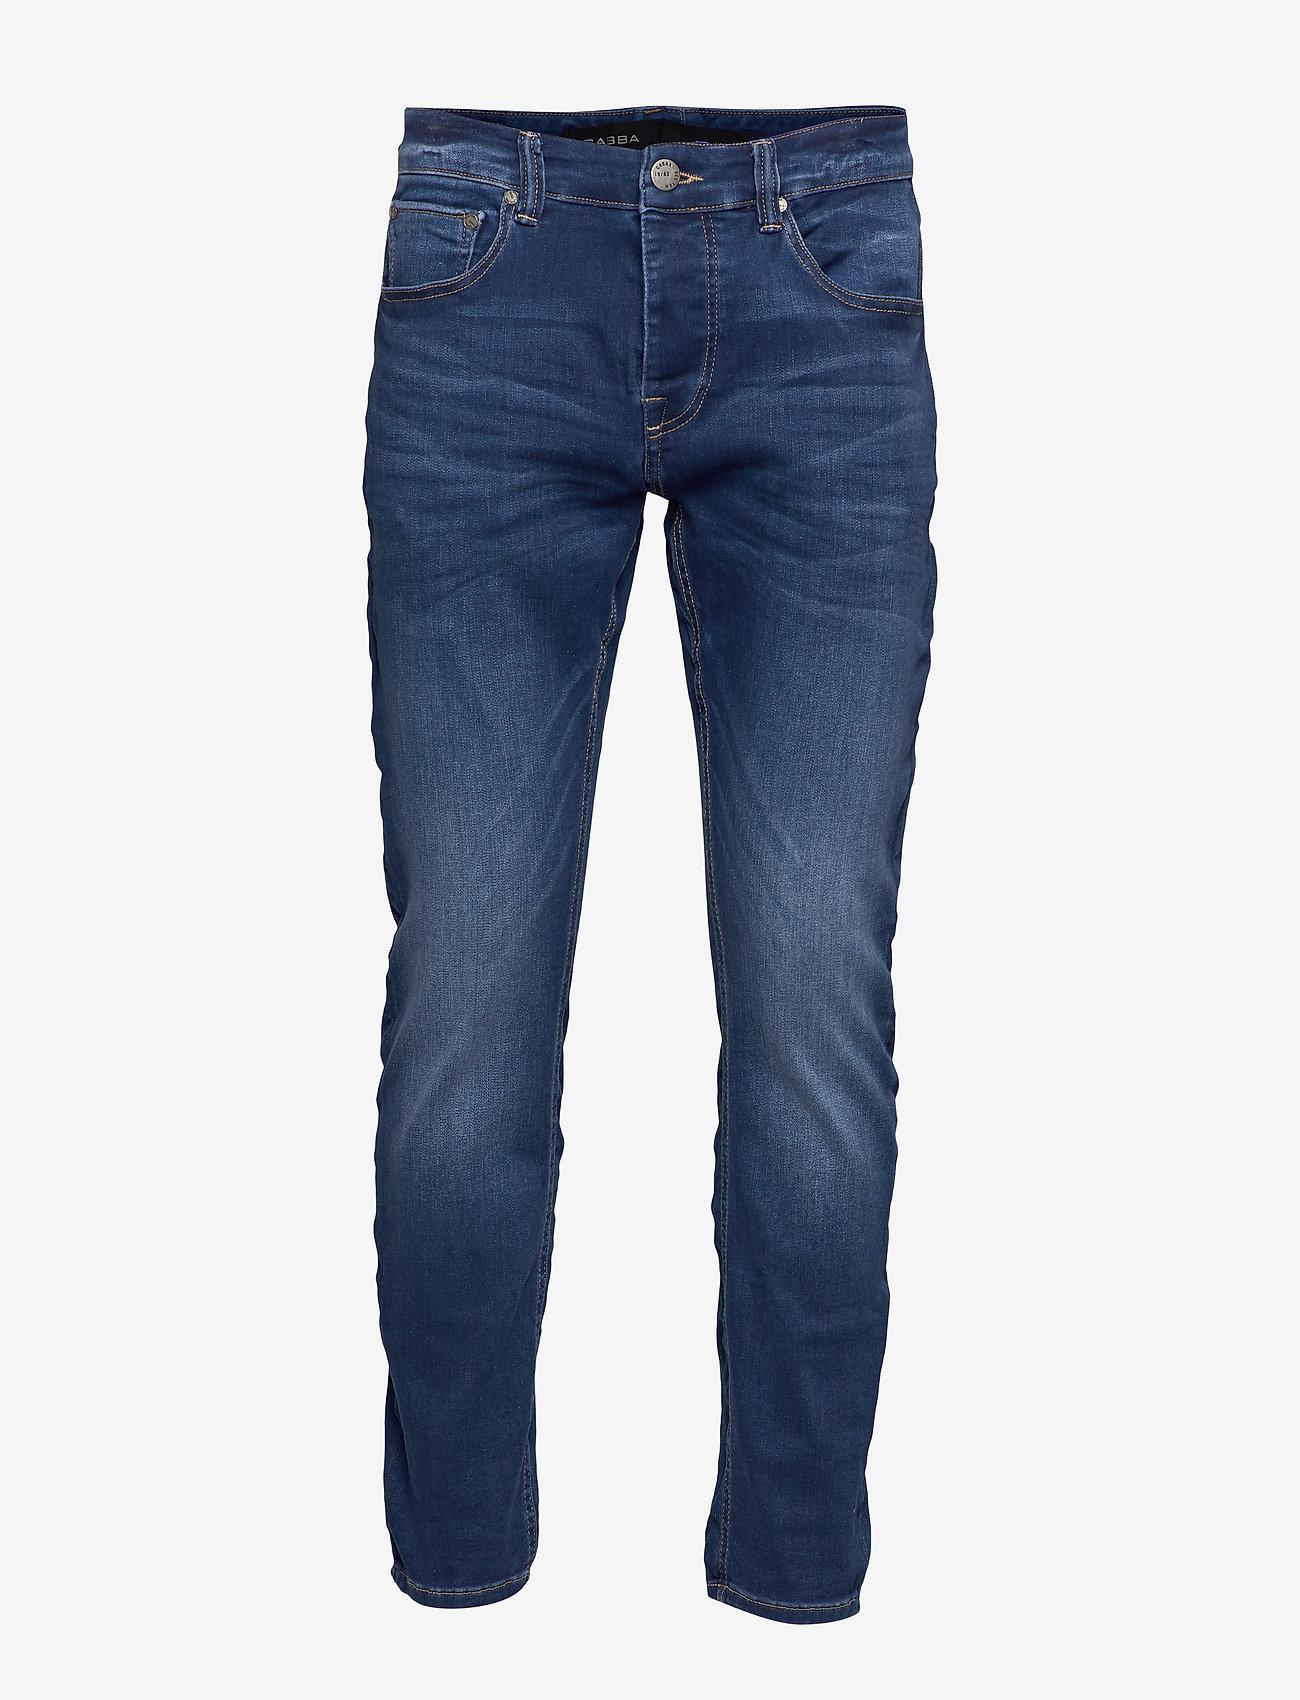 Gabba - Jones K2213 Bright - slim jeans - rs1099 - 0